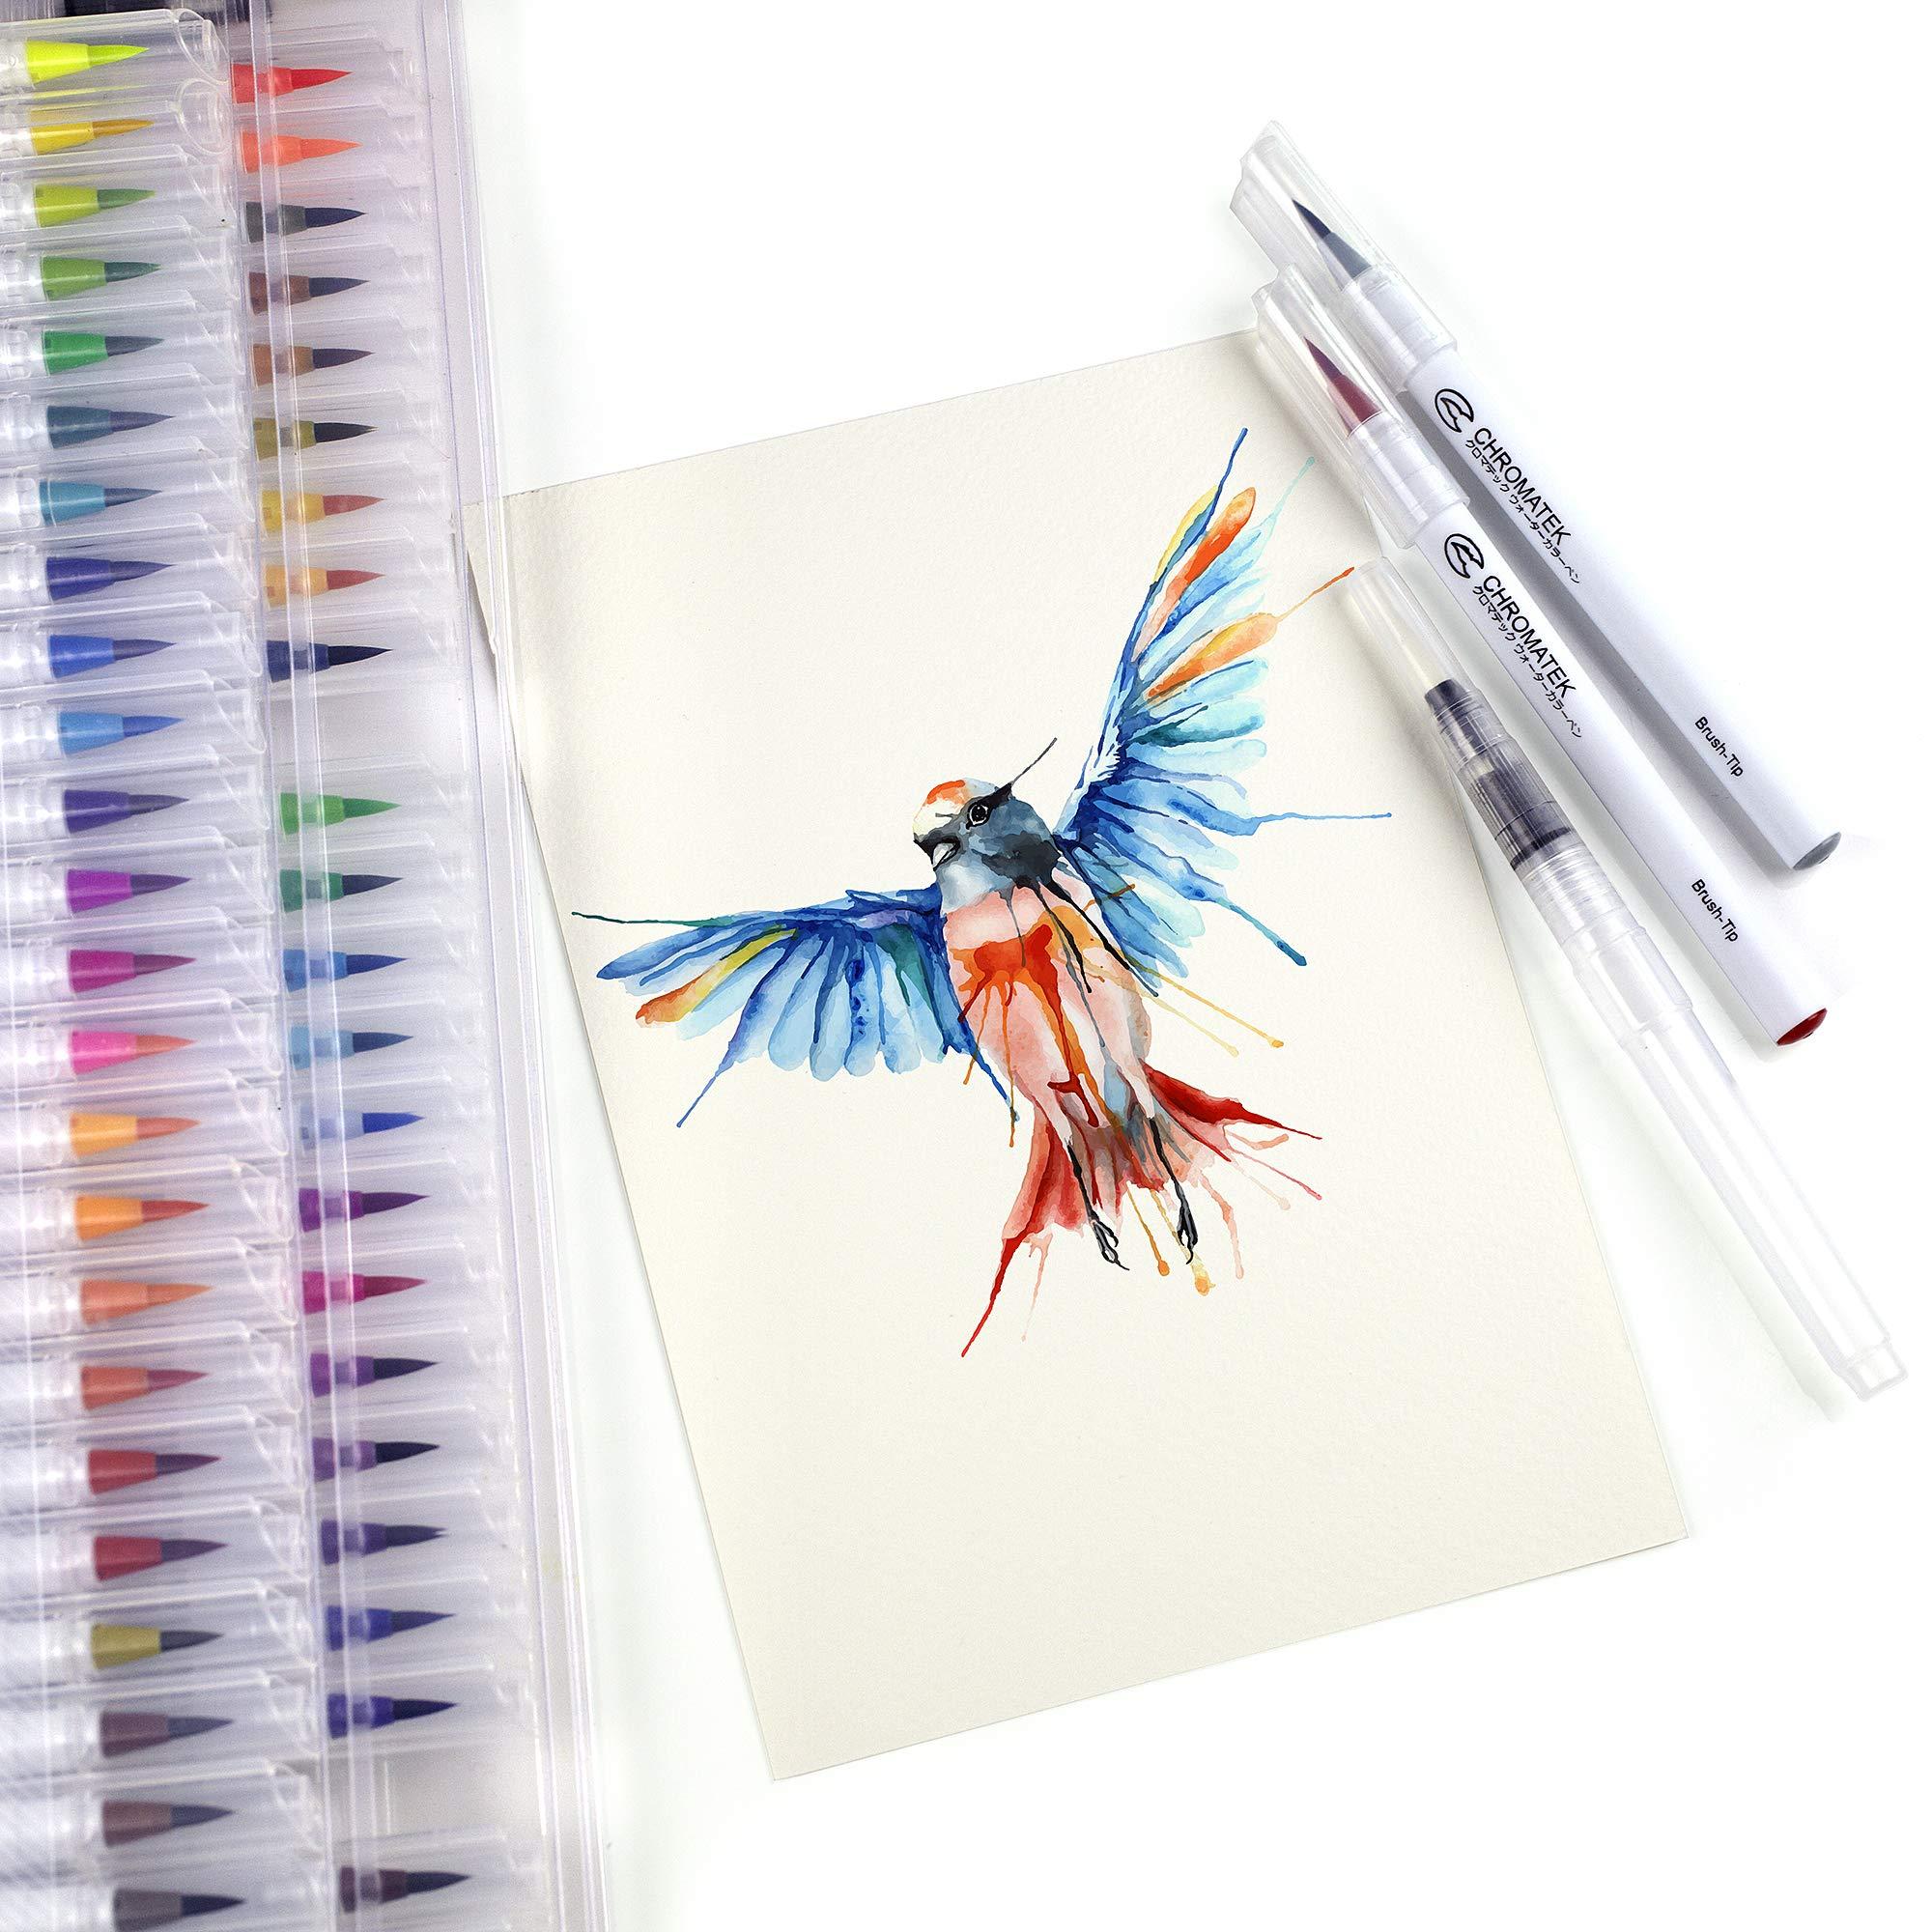 52 Watercolor Brush Pens, Tutorial Pad & Video Series by Chromatek. Real Brush Tip. Vivid. Smooth. Blendable. Long Lasting. Professional Artist Quality. 50 Colors 2 Blending Brushes. by Chromatek (Image #3)